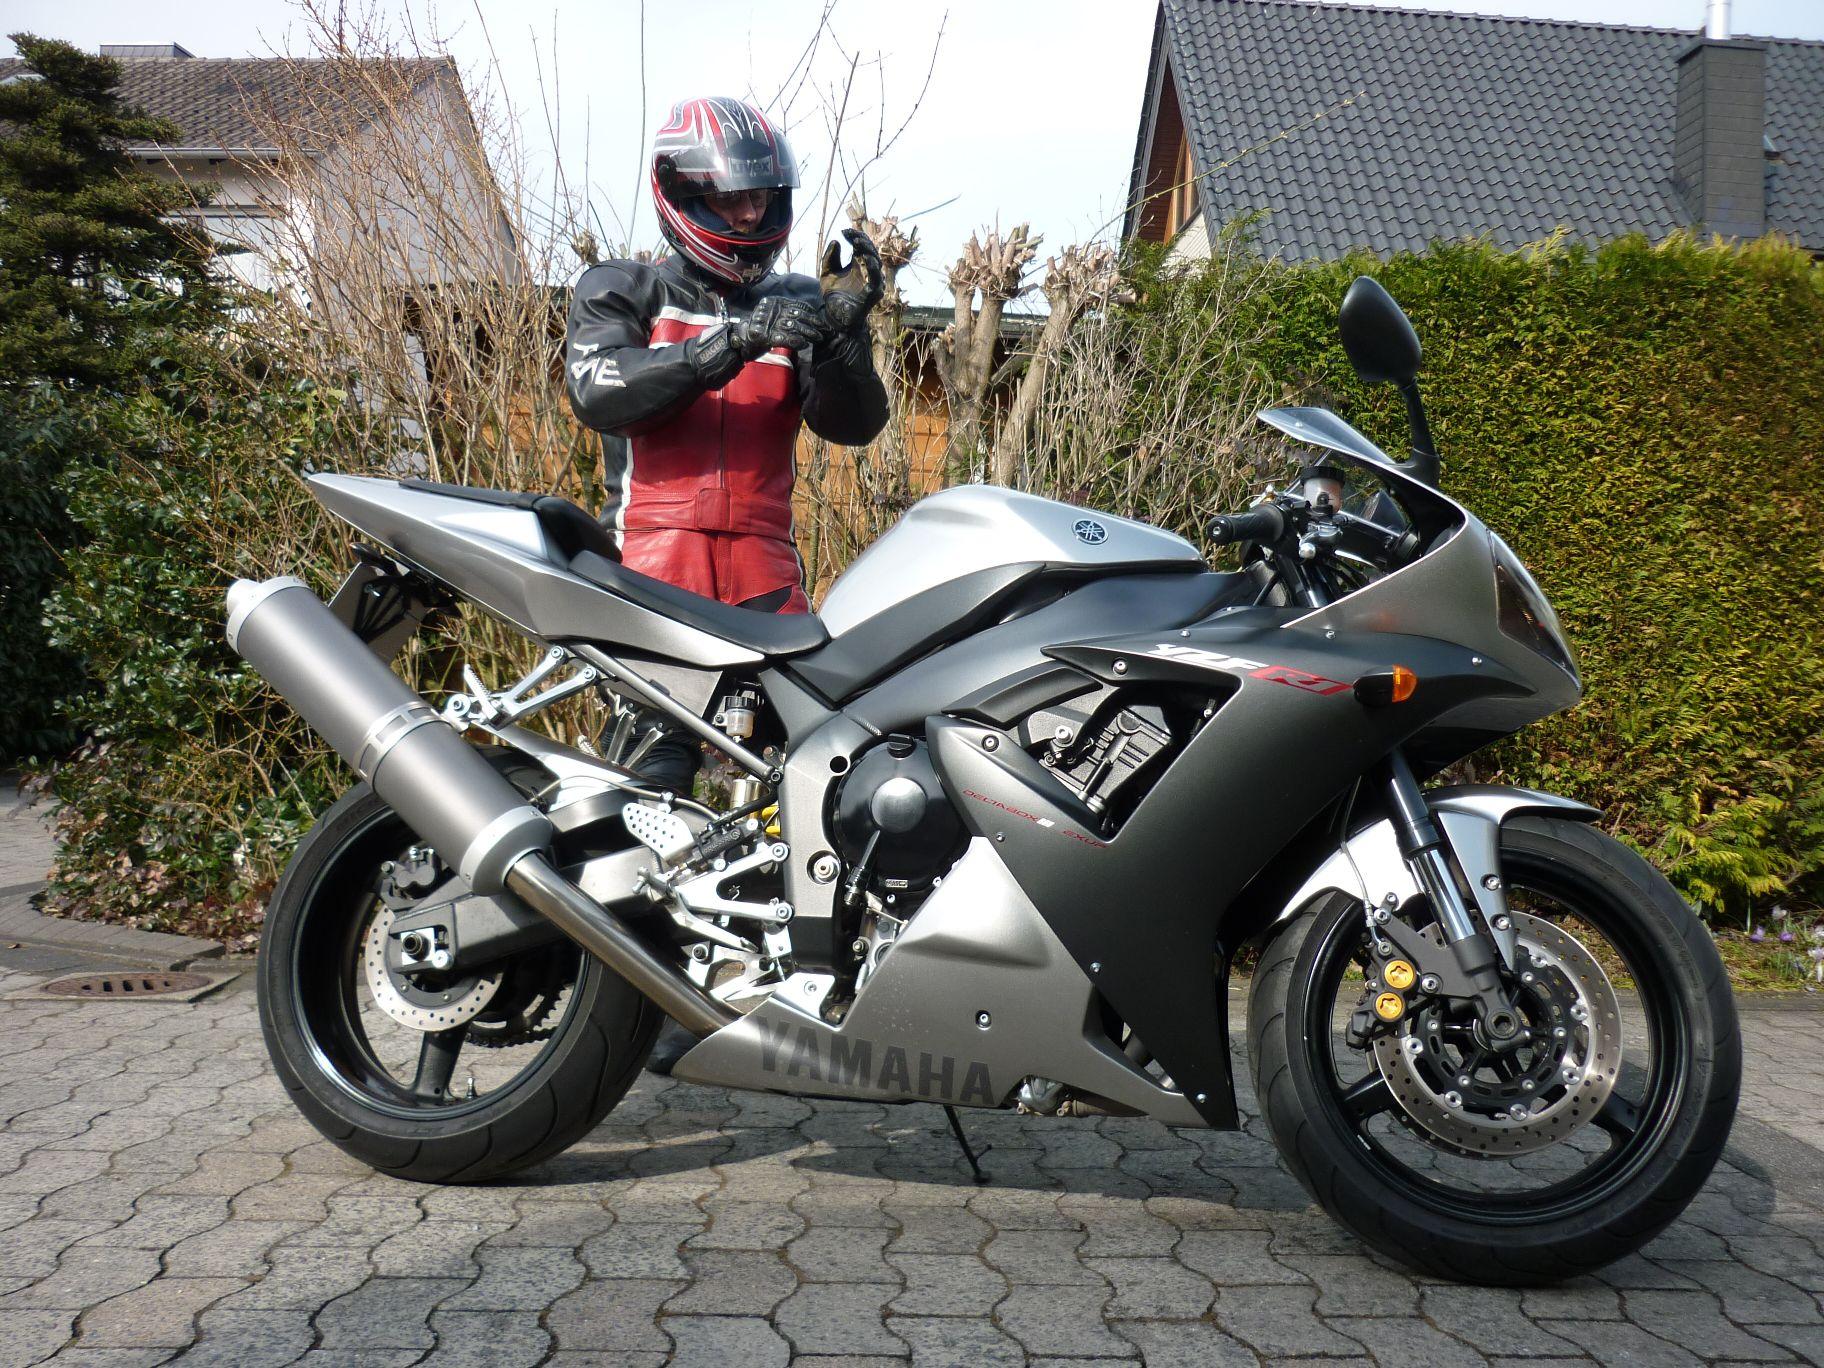 Rn Silber Yamaha R1 Rn04